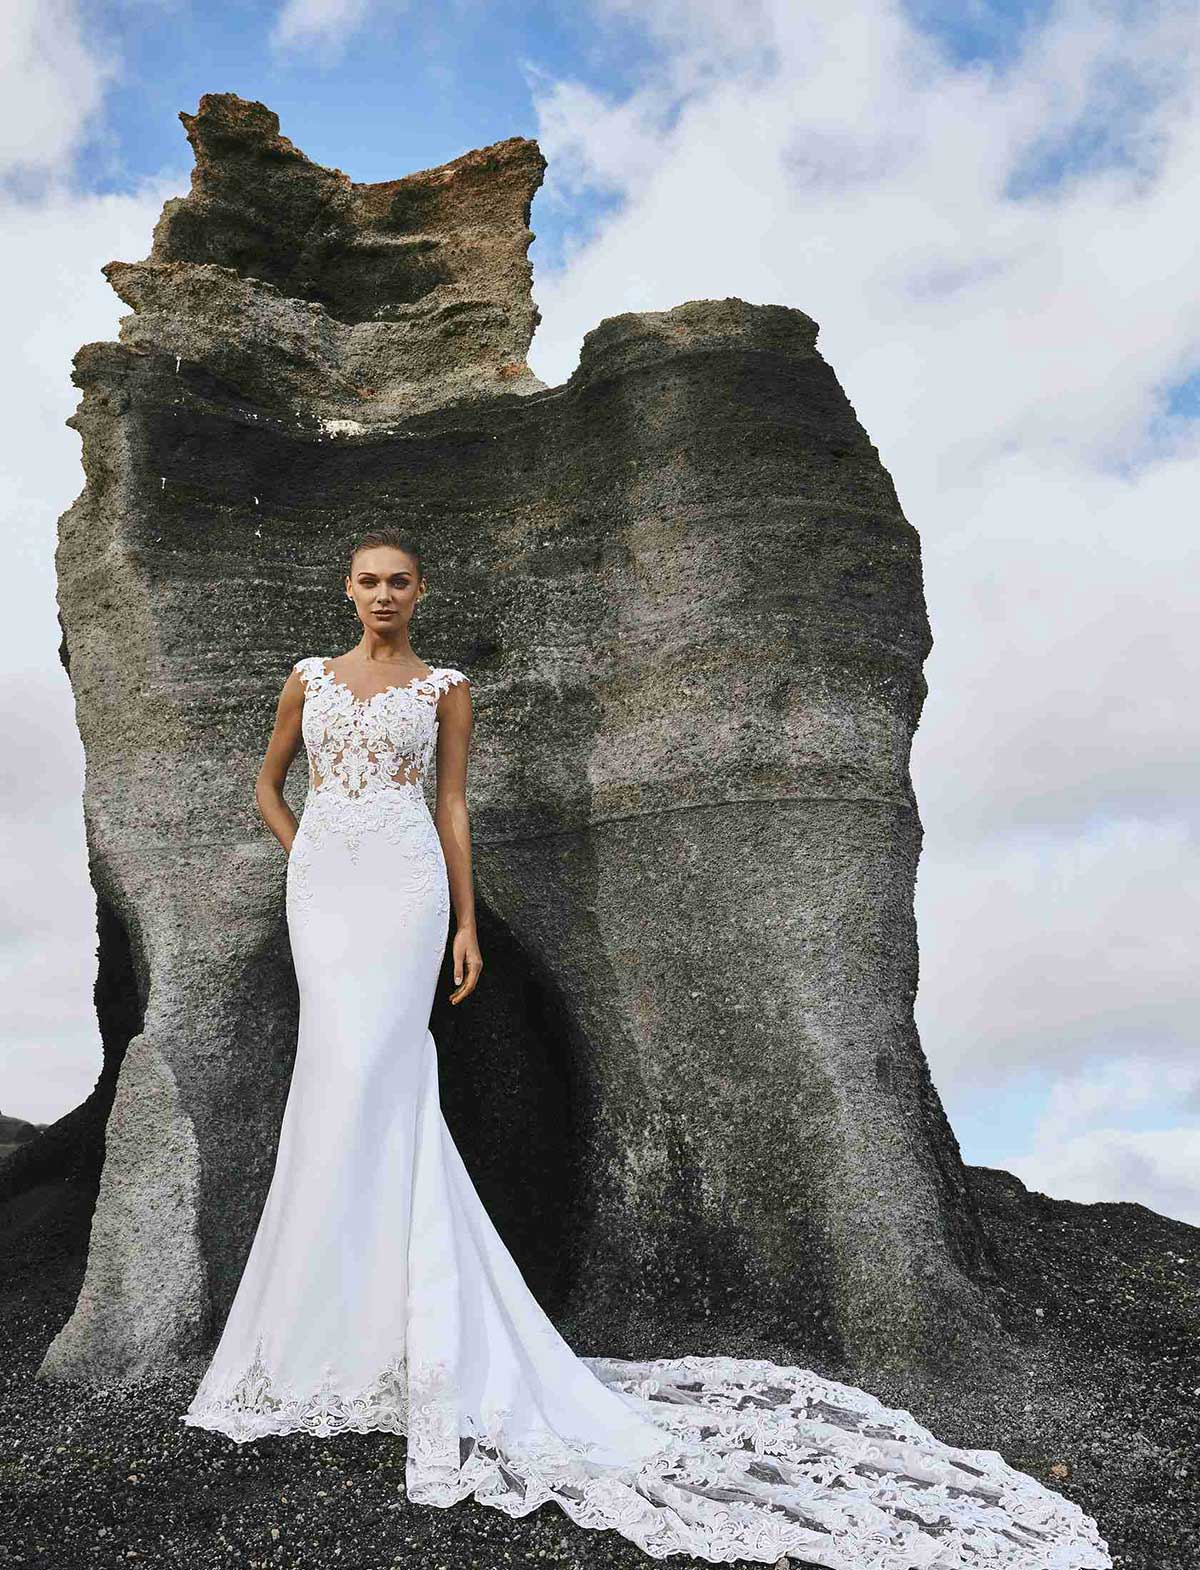 Pronovias Abito Sposa Waitomo 2022